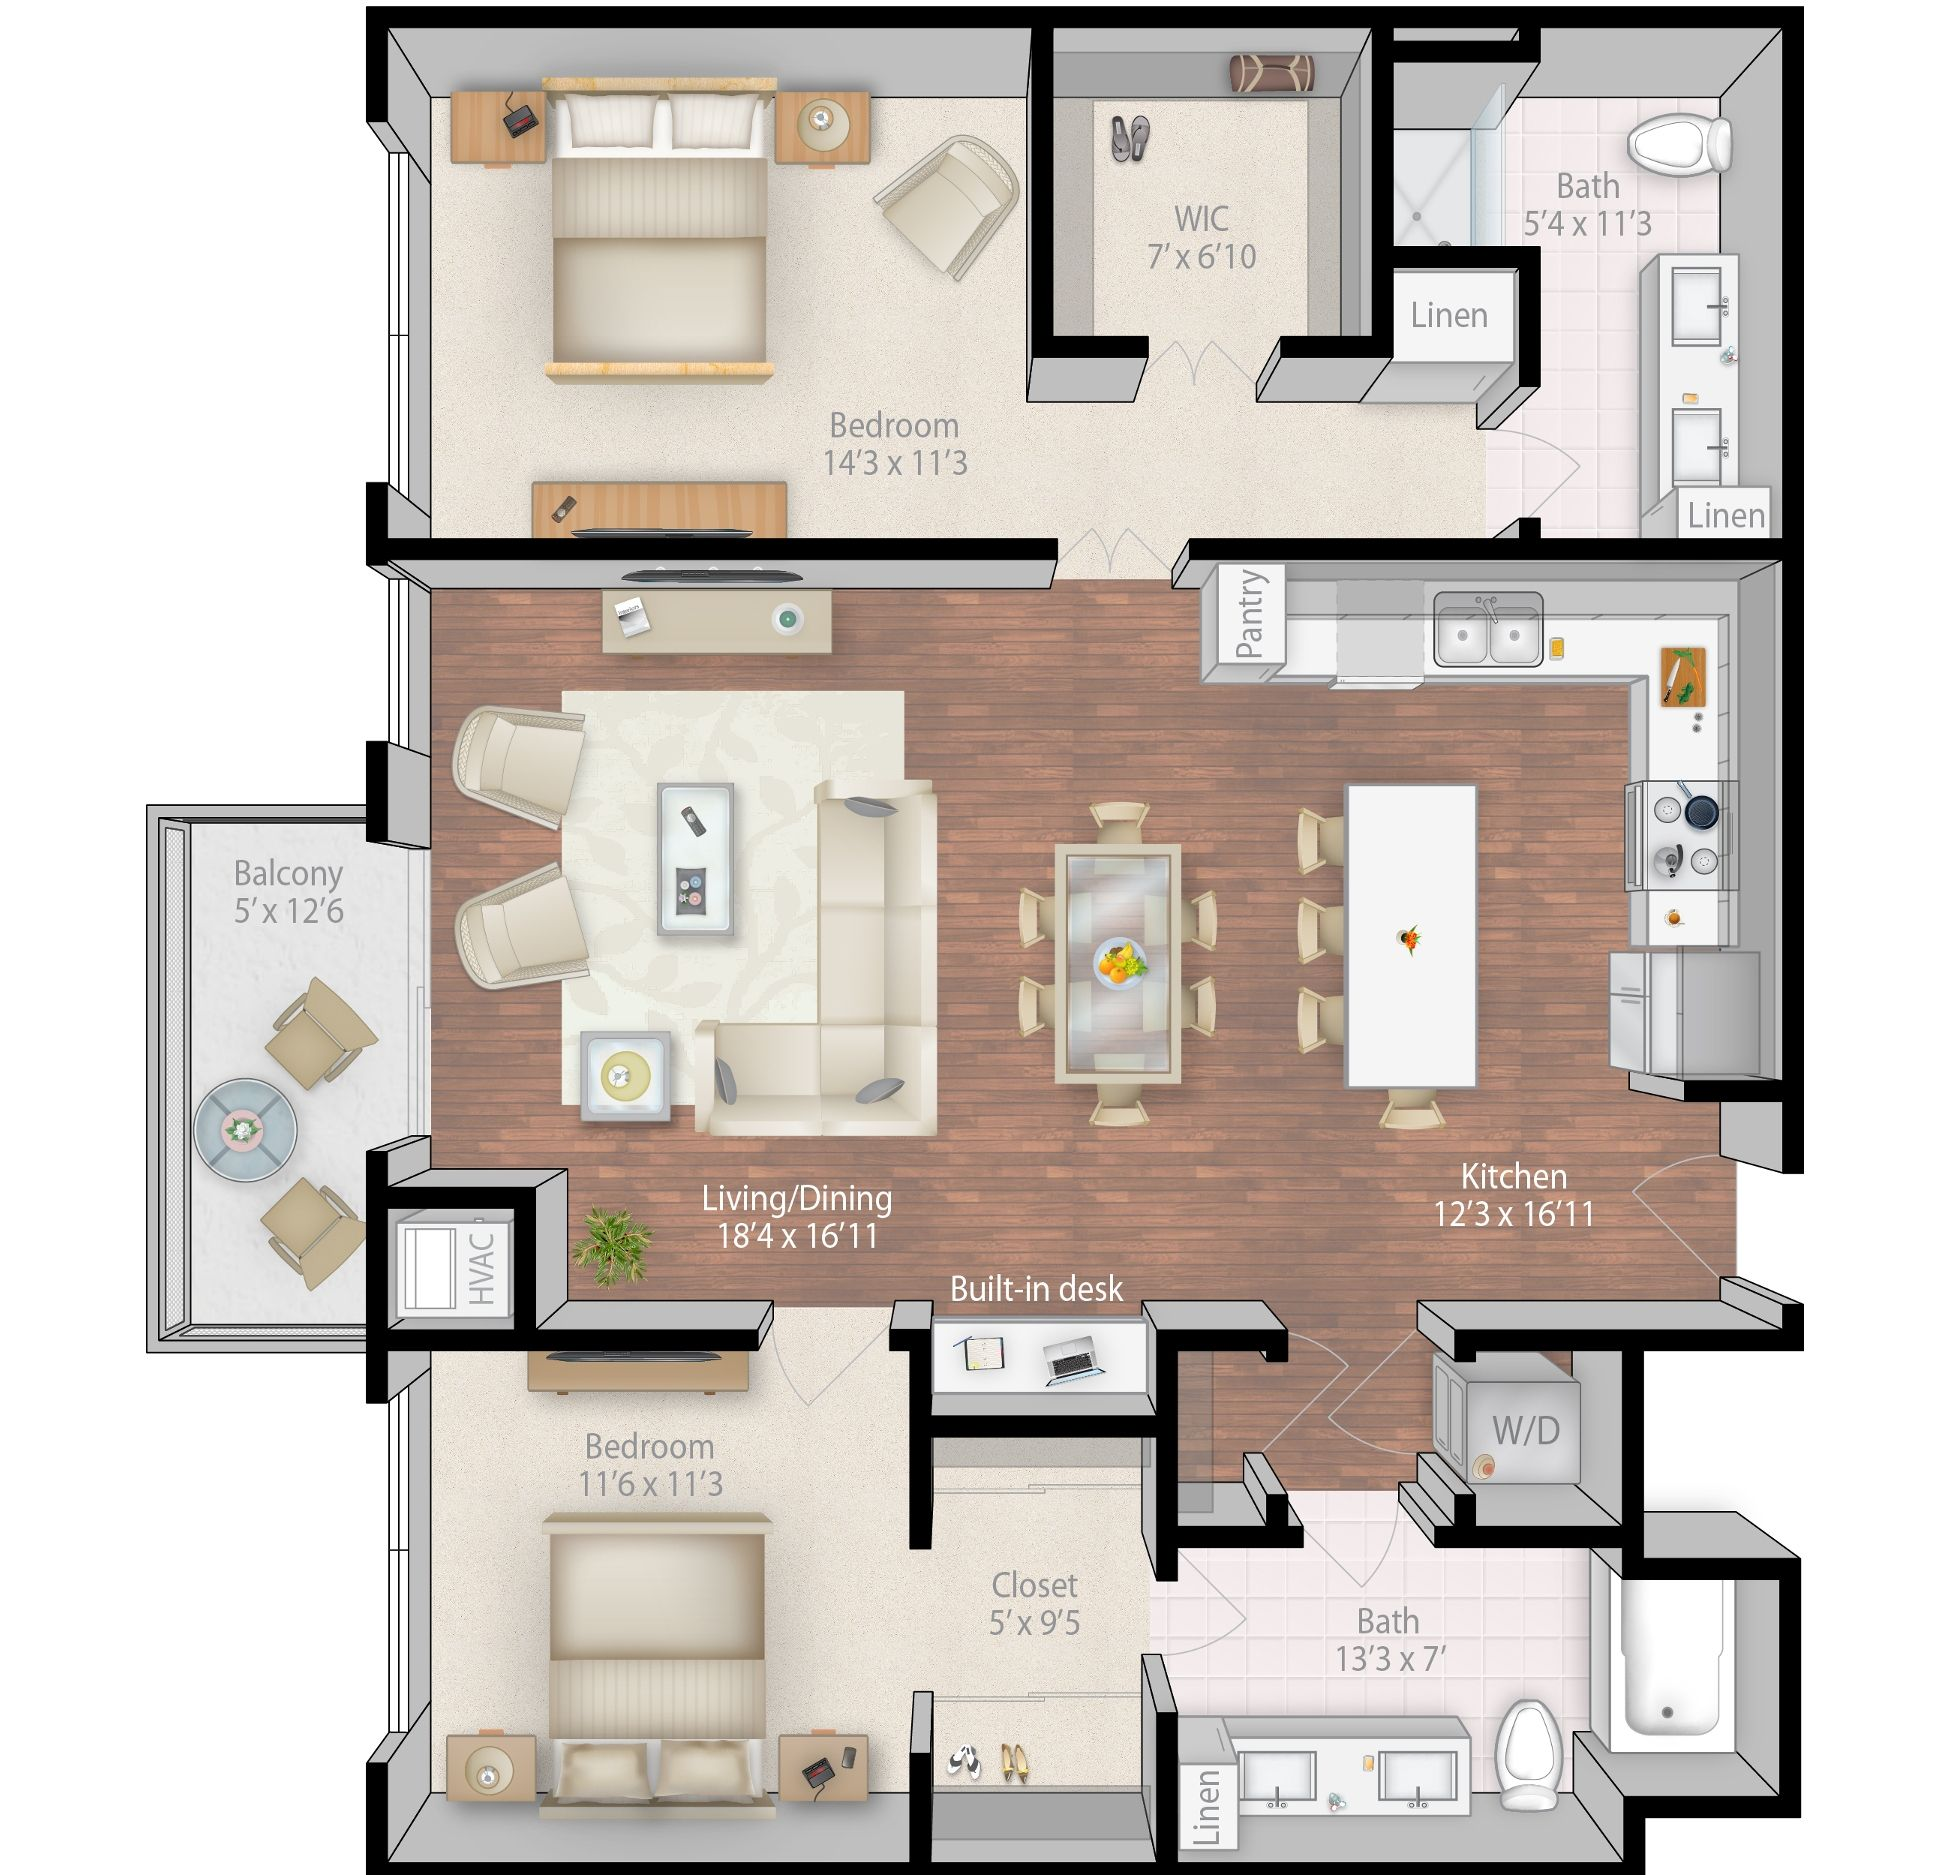 Luxury Condos Floor Plans Condo Floor Plans Apartment Floor